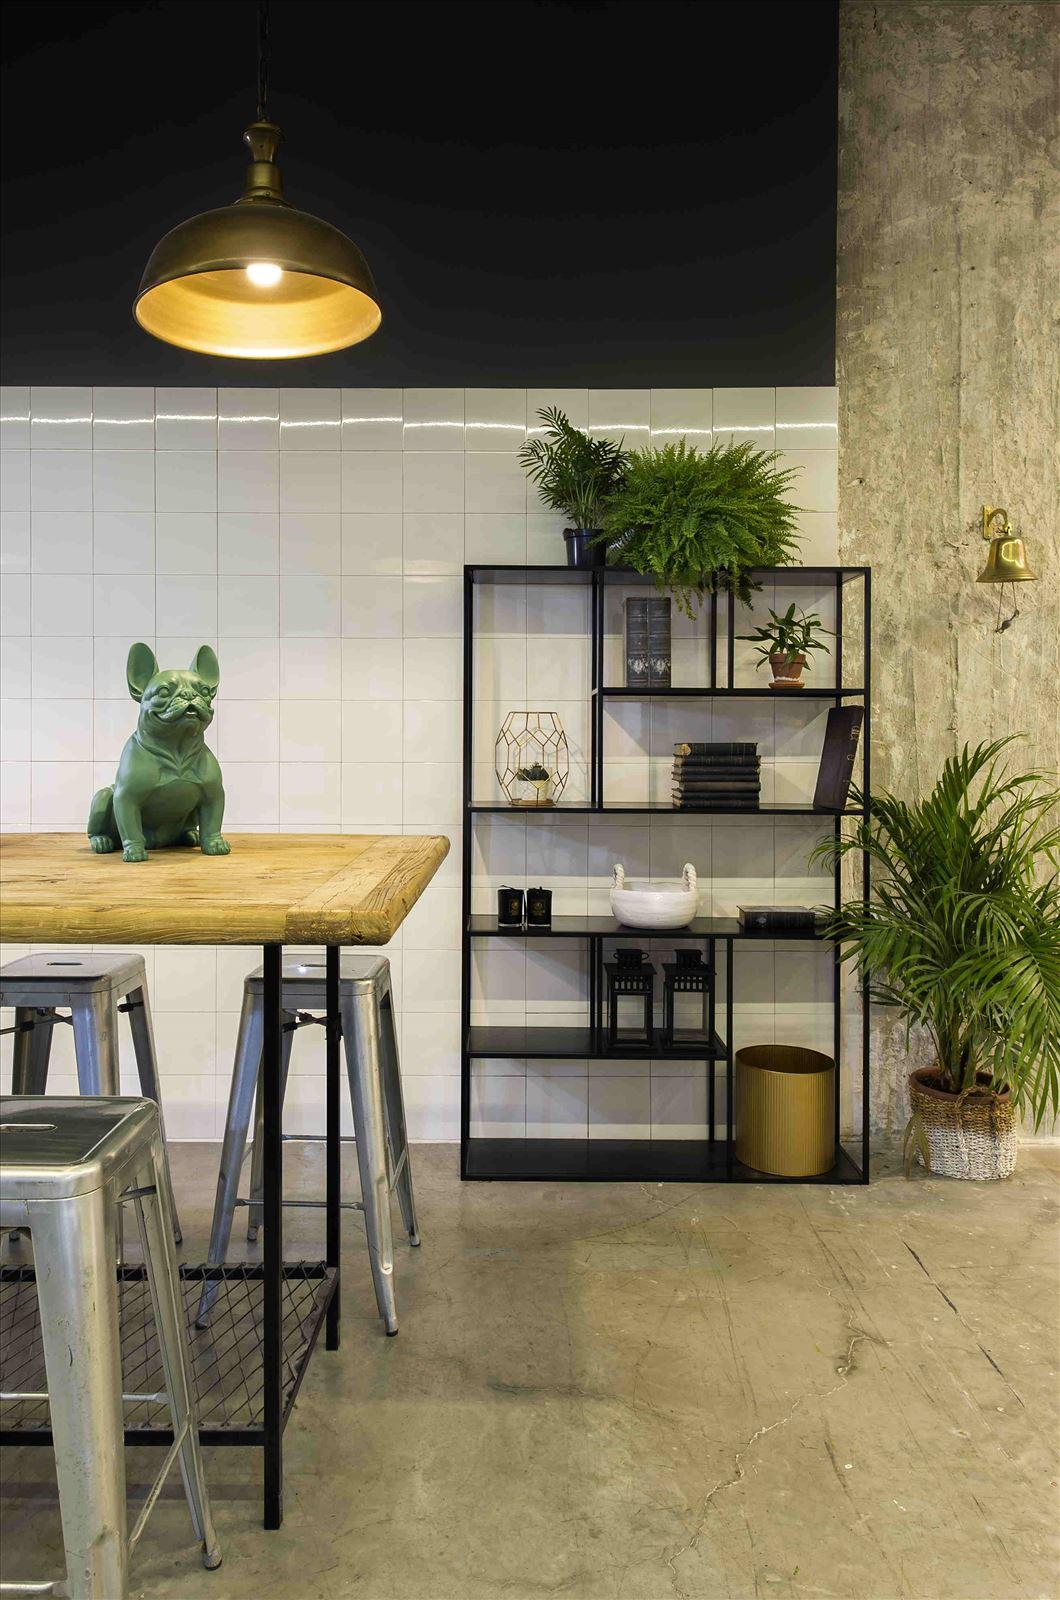 Ewave Offices פרויקט תאורה במשרדים על ידי קמחי תאורה